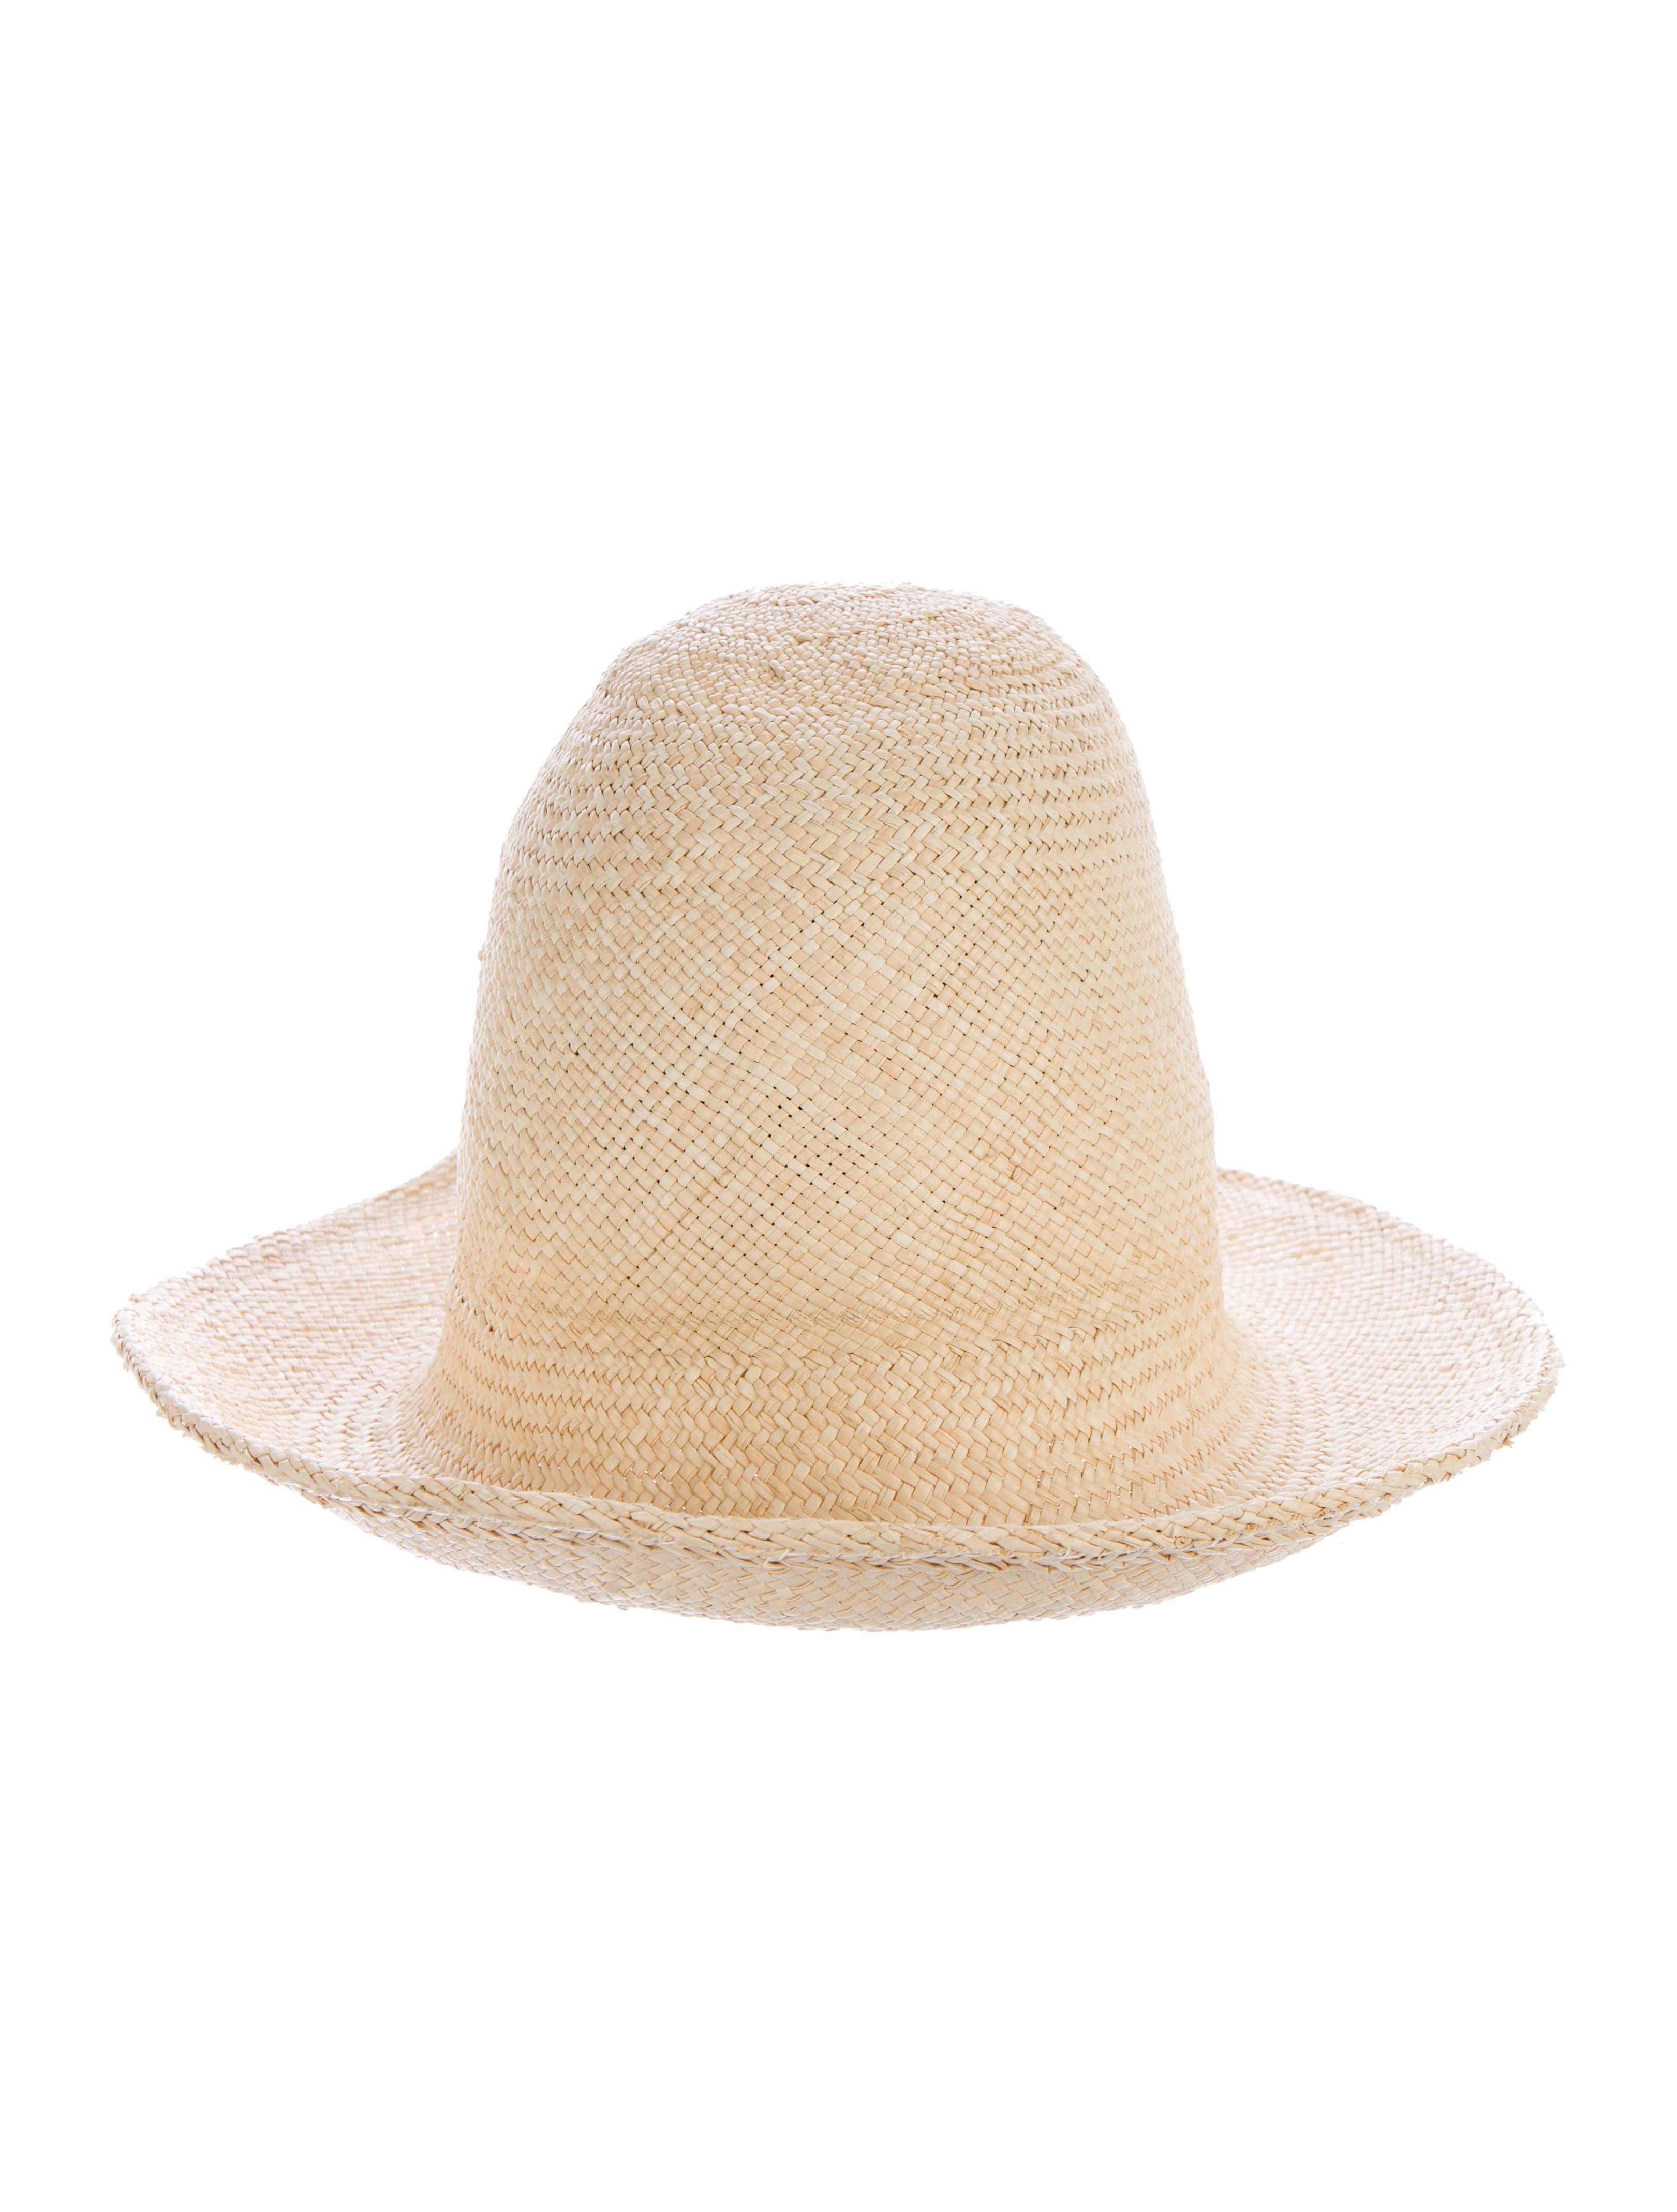 ACCESSORIES - Hats Jil Sander cLwSn